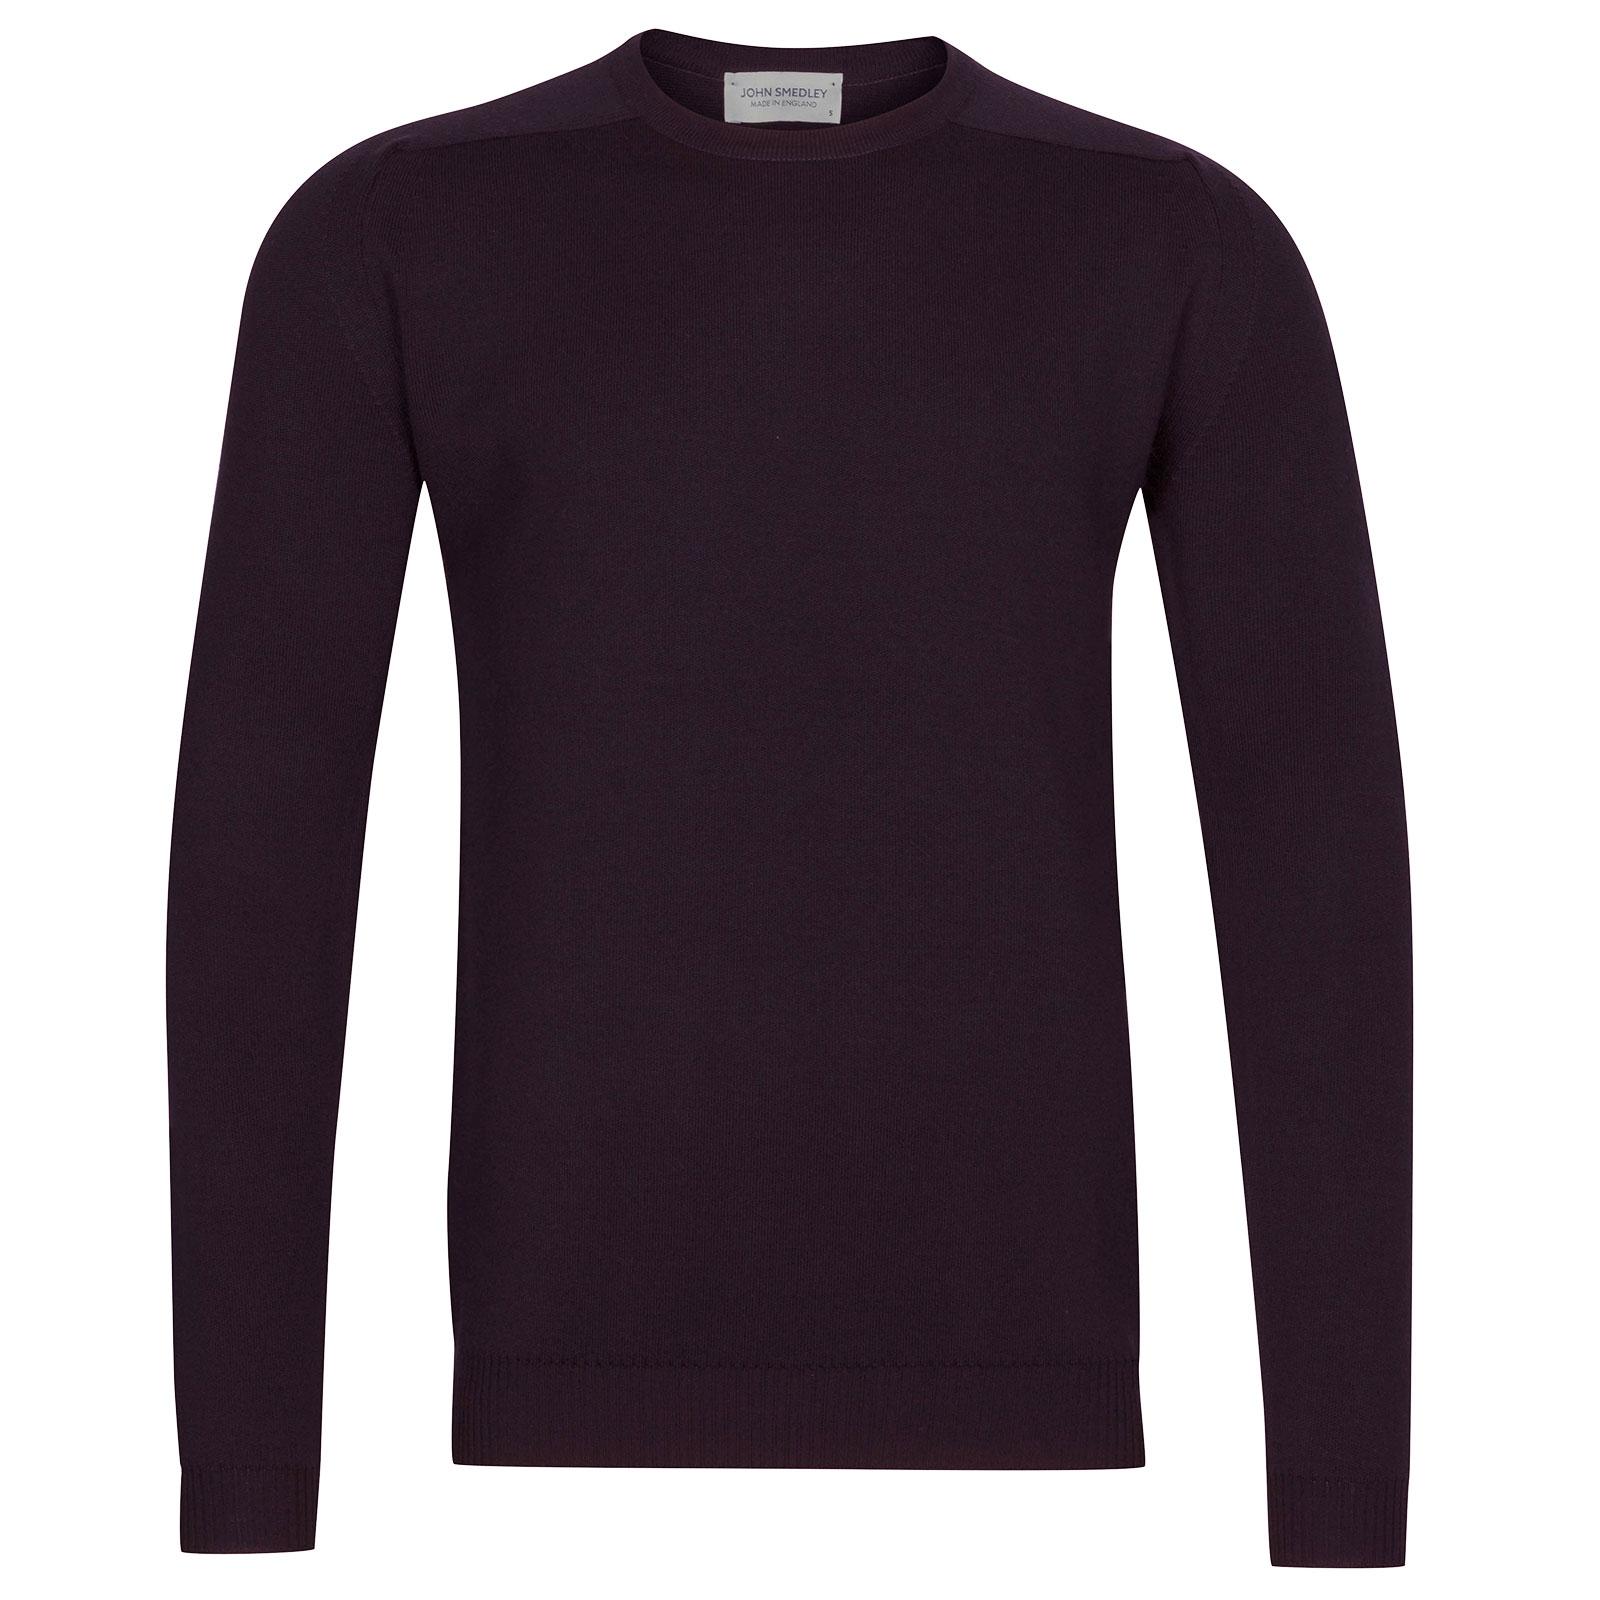 John Smedley Hawling Merino Wool Pullover in Mystic Purple-XL